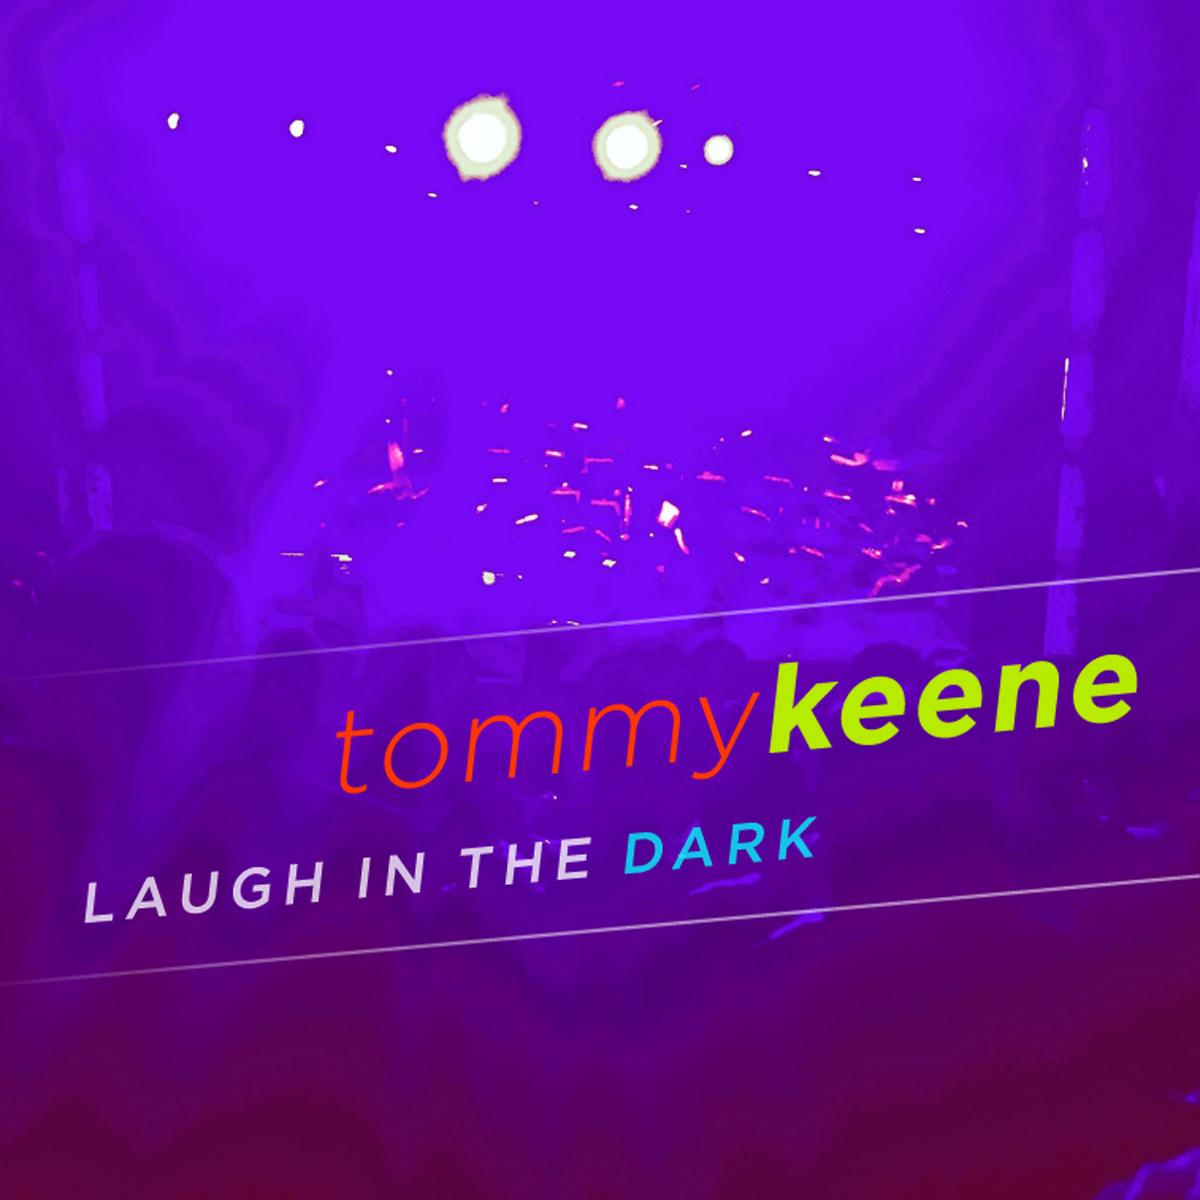 tommy-keene-laugh-in-the-dark.jpg